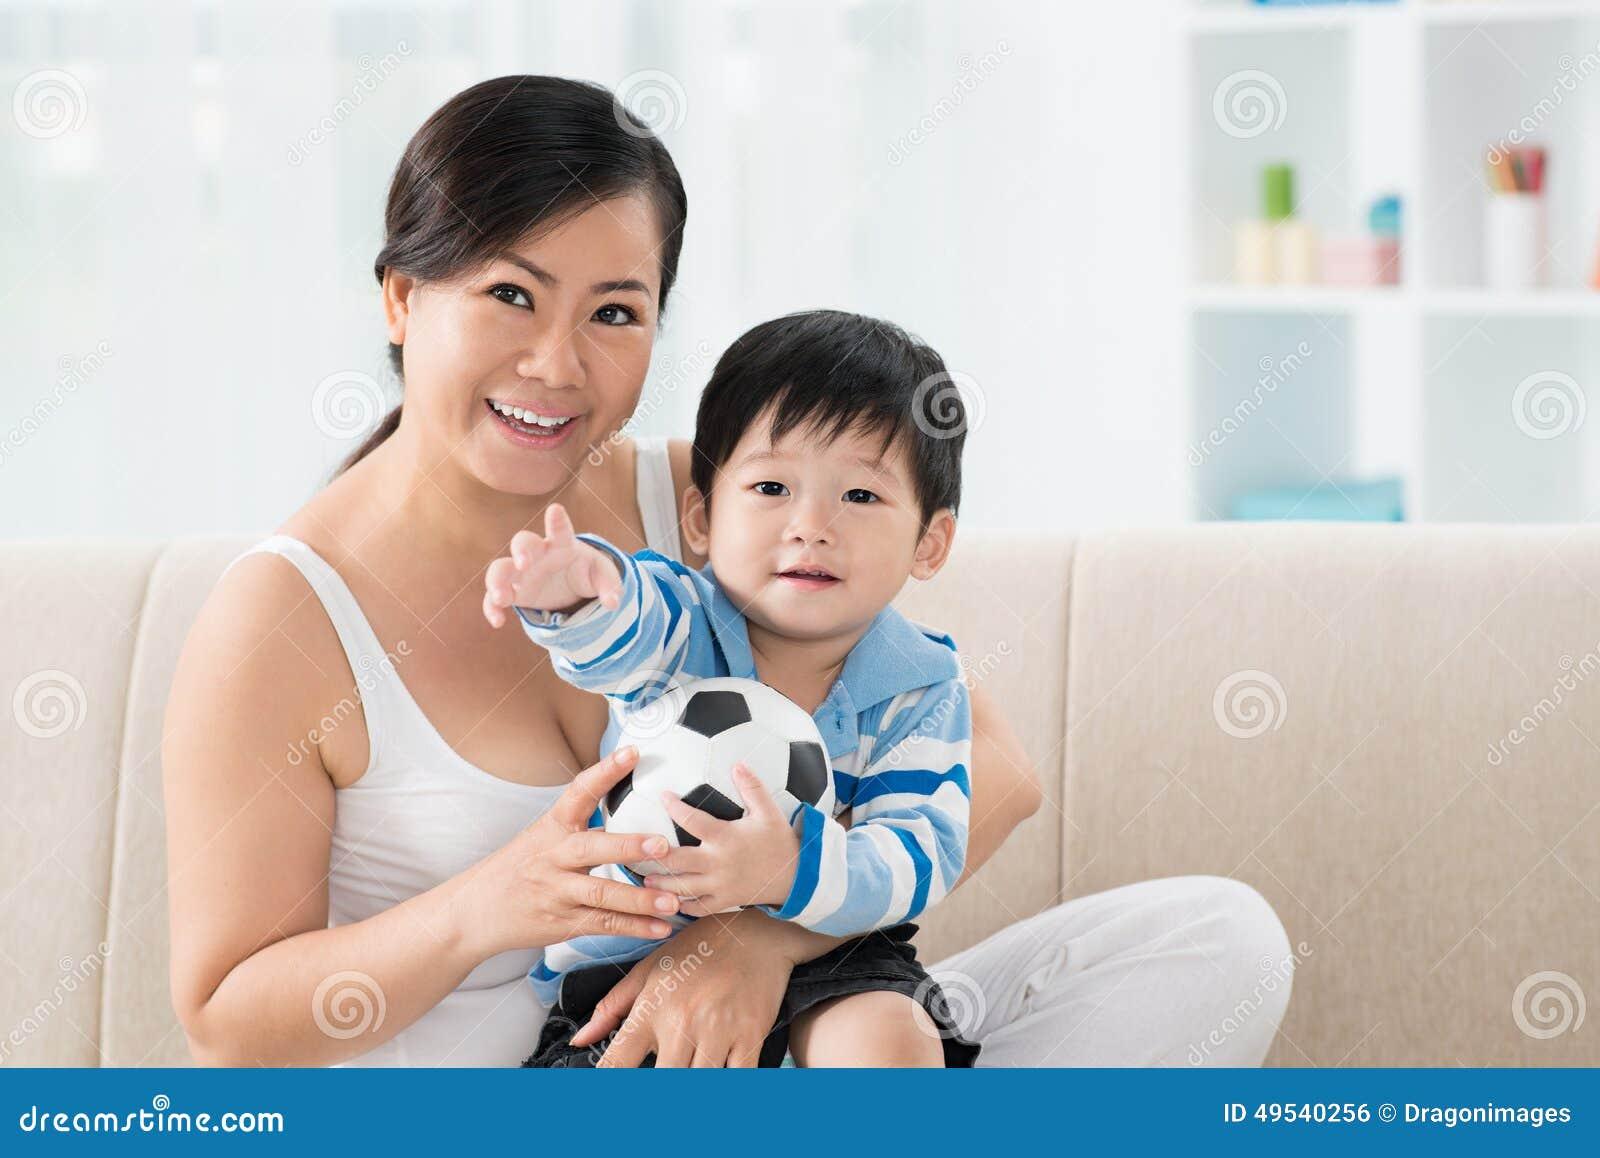 Mother fuck son asian